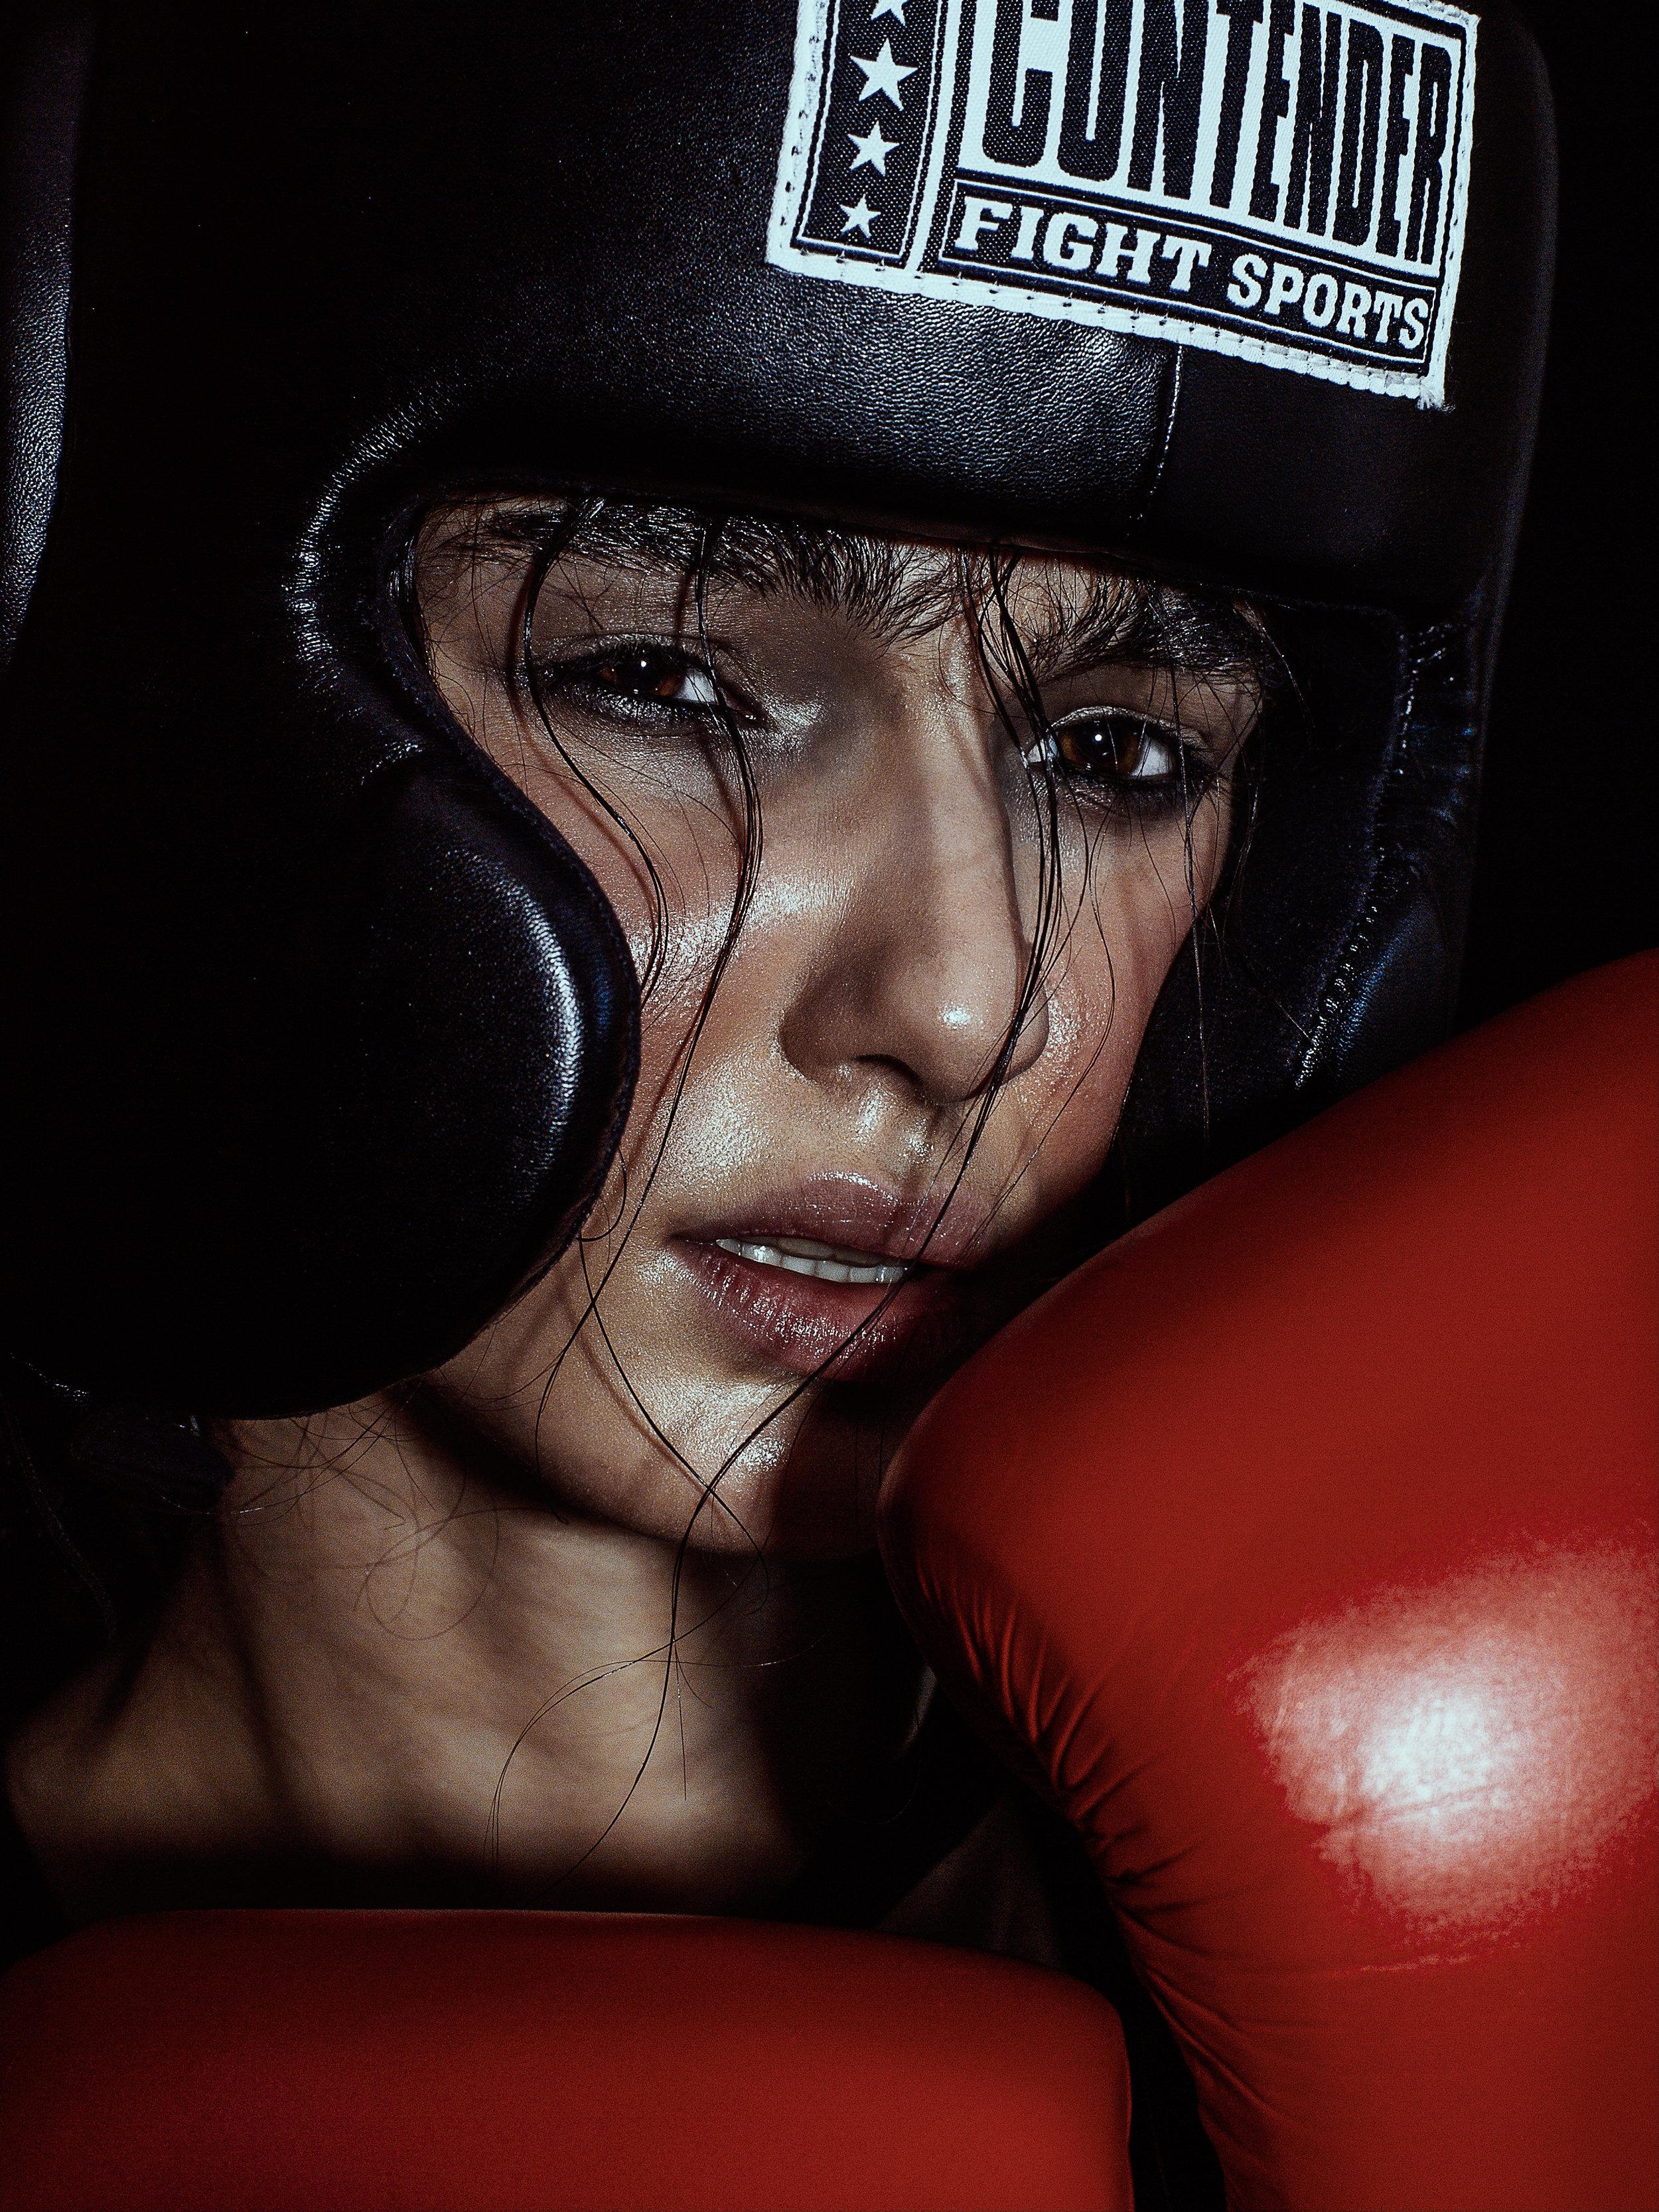 Roberto_Vazquez_boxing0006.jpg